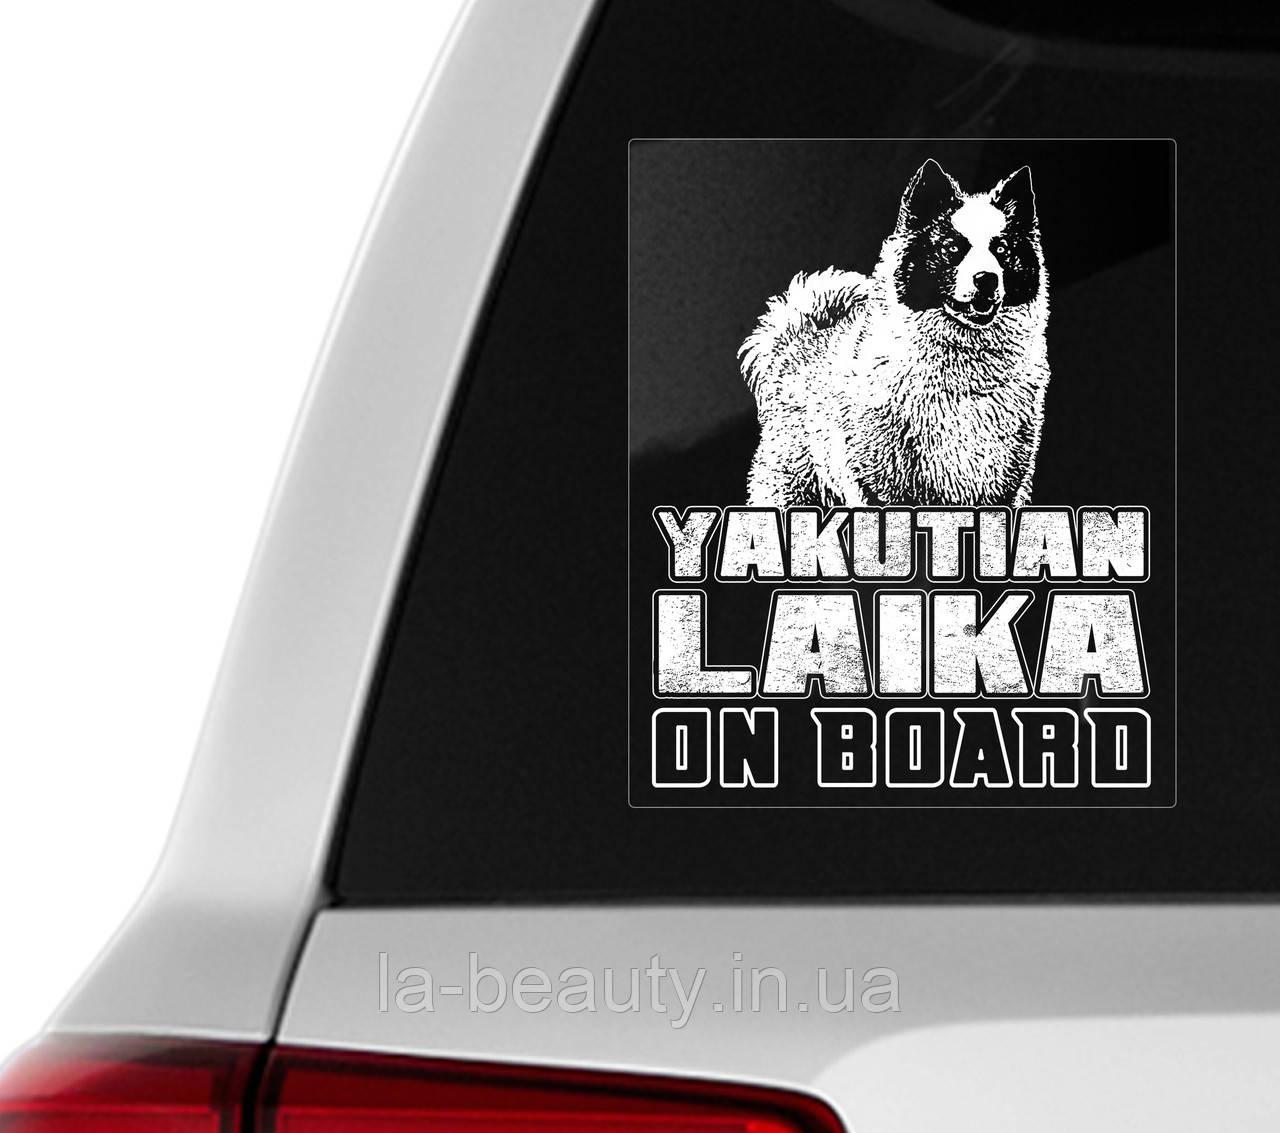 Автомобильная наклейка на стекло Якутская лайка на борту (Yakutian Laika On Board)